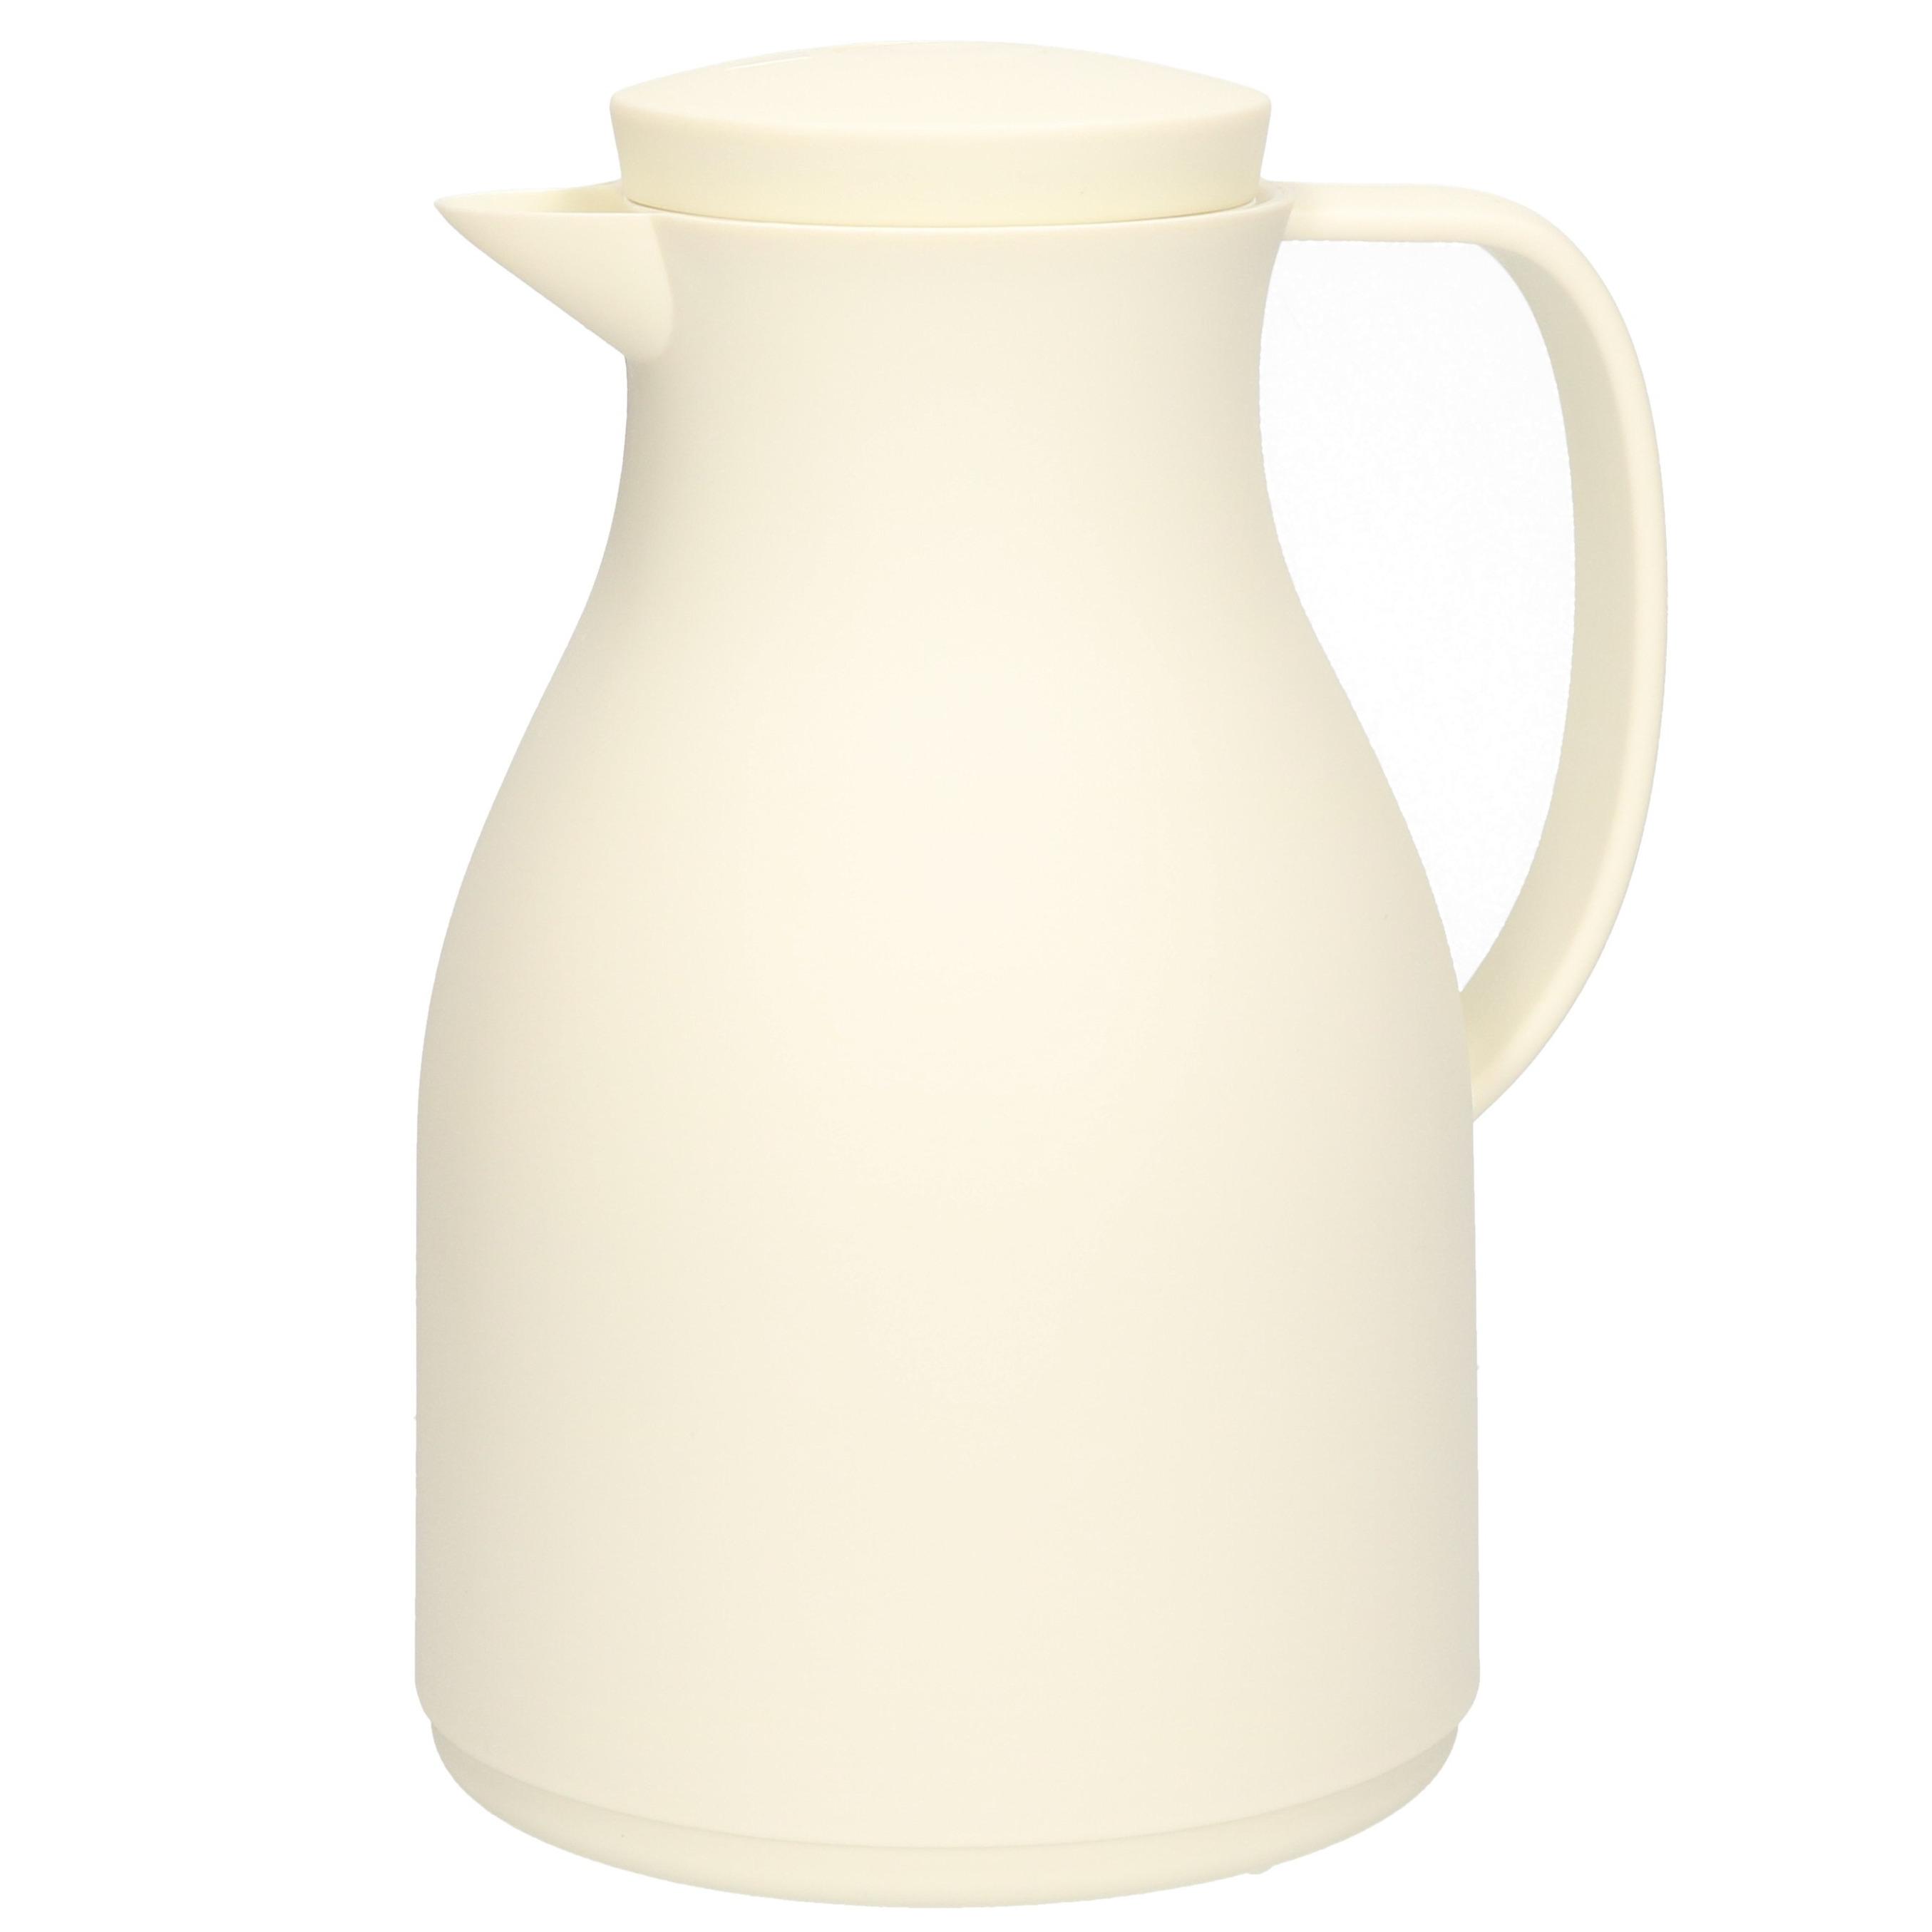 Isoleerkan/koffiekan wit 1 liter met drukknop -